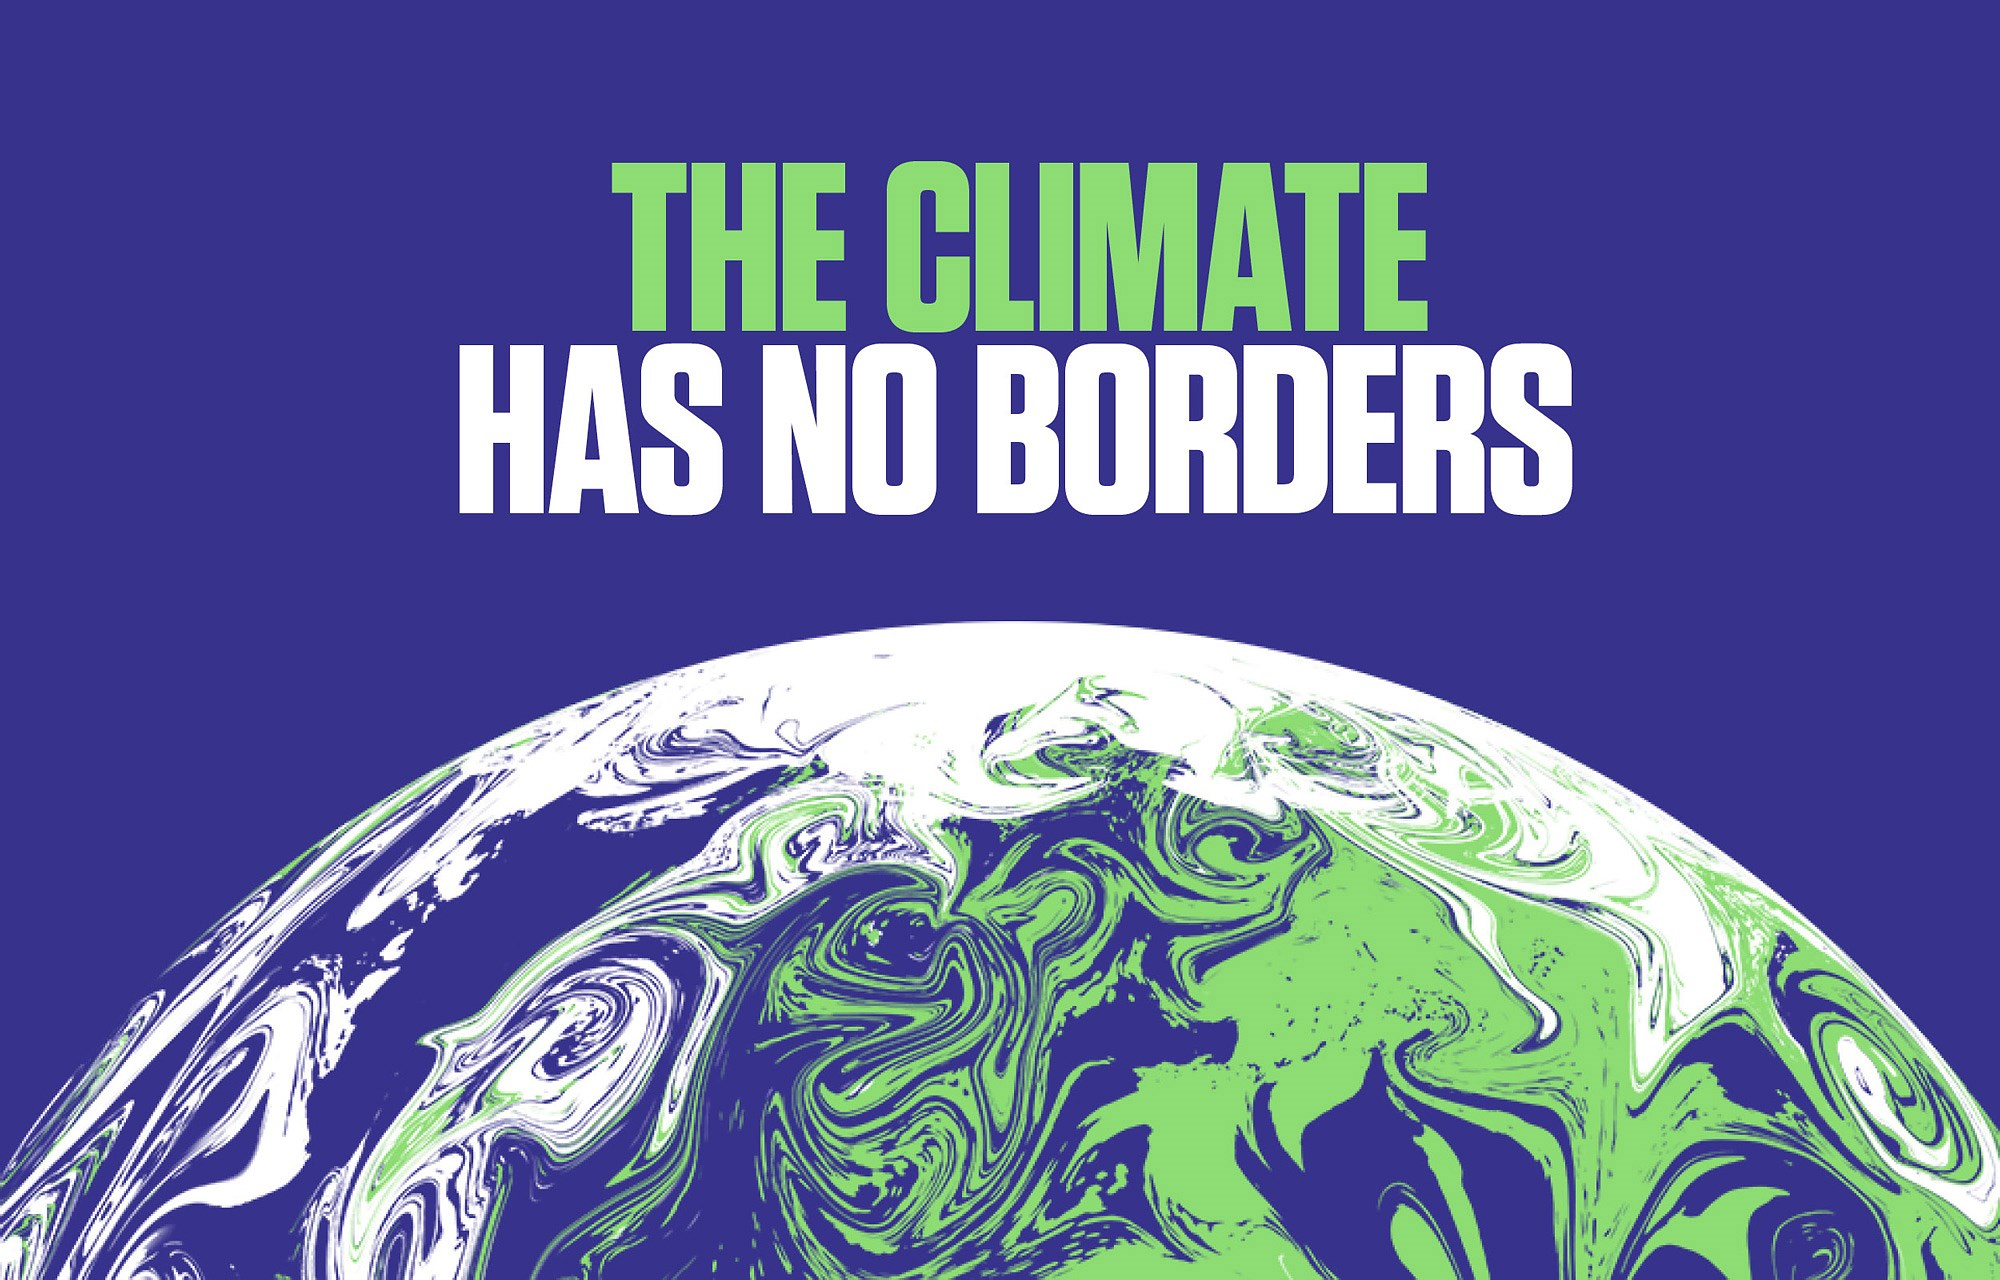 03-un_climate_change_conference_tagline.jpg